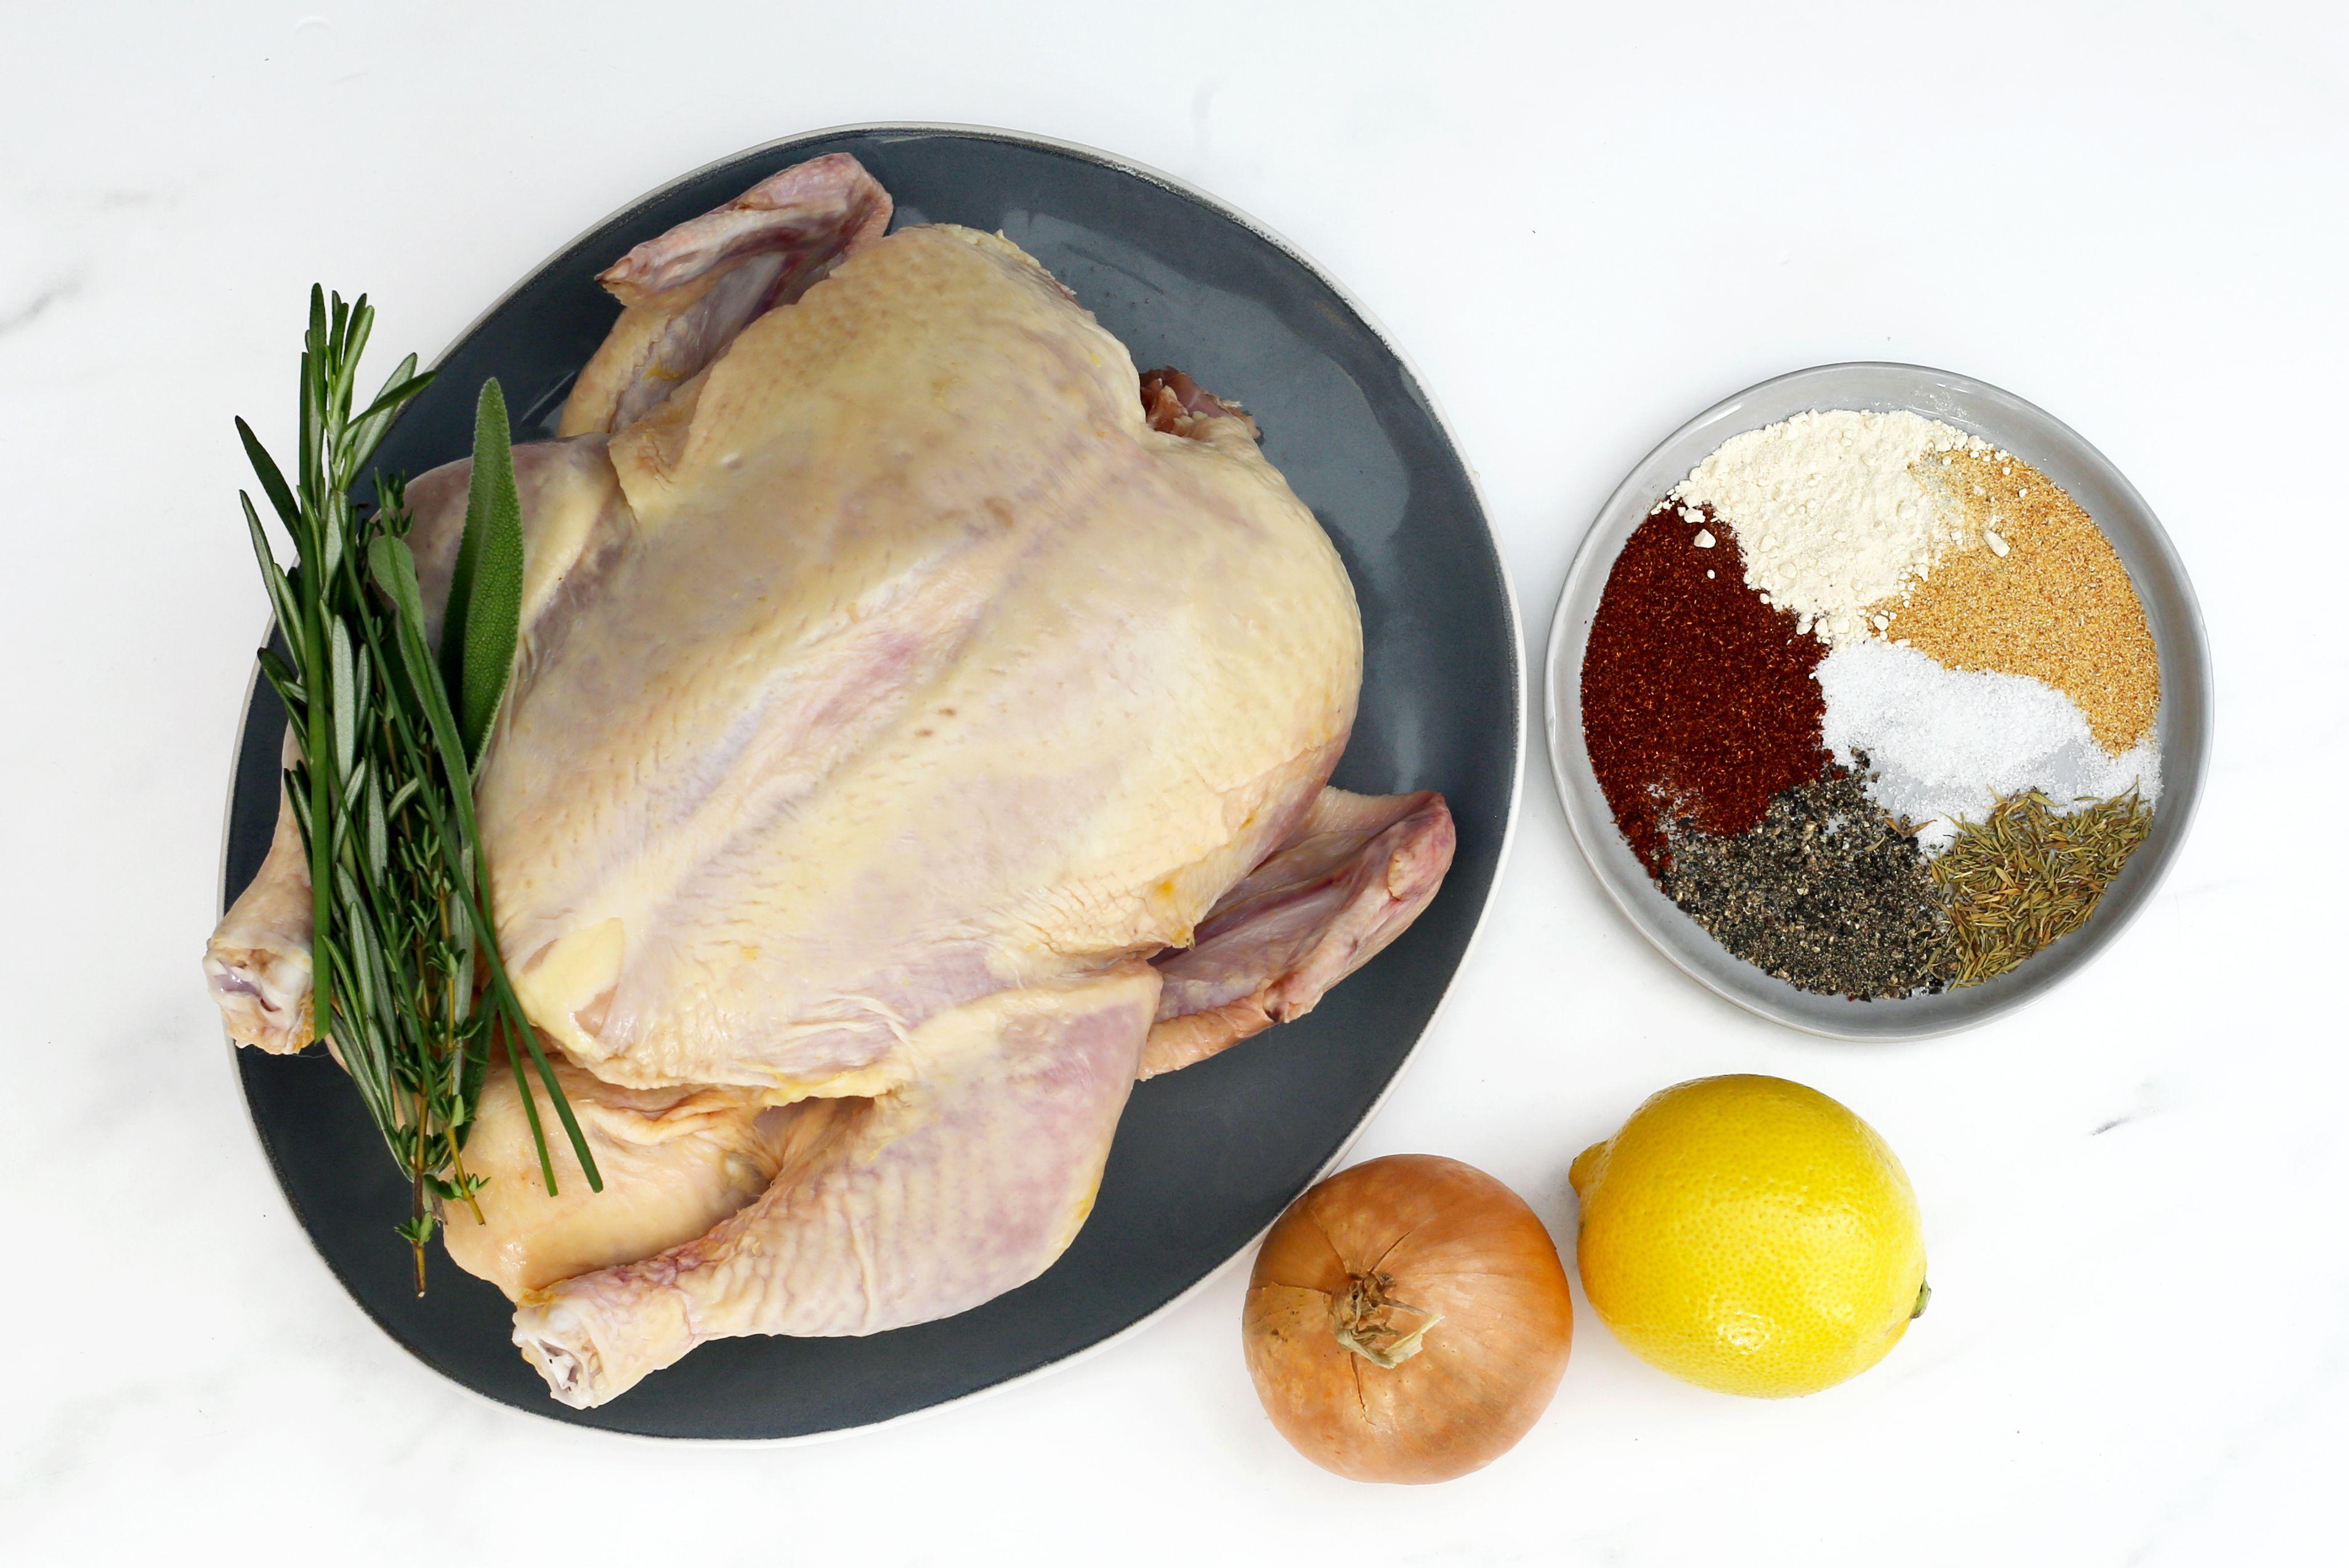 Instant Pot whole chicken ingredients